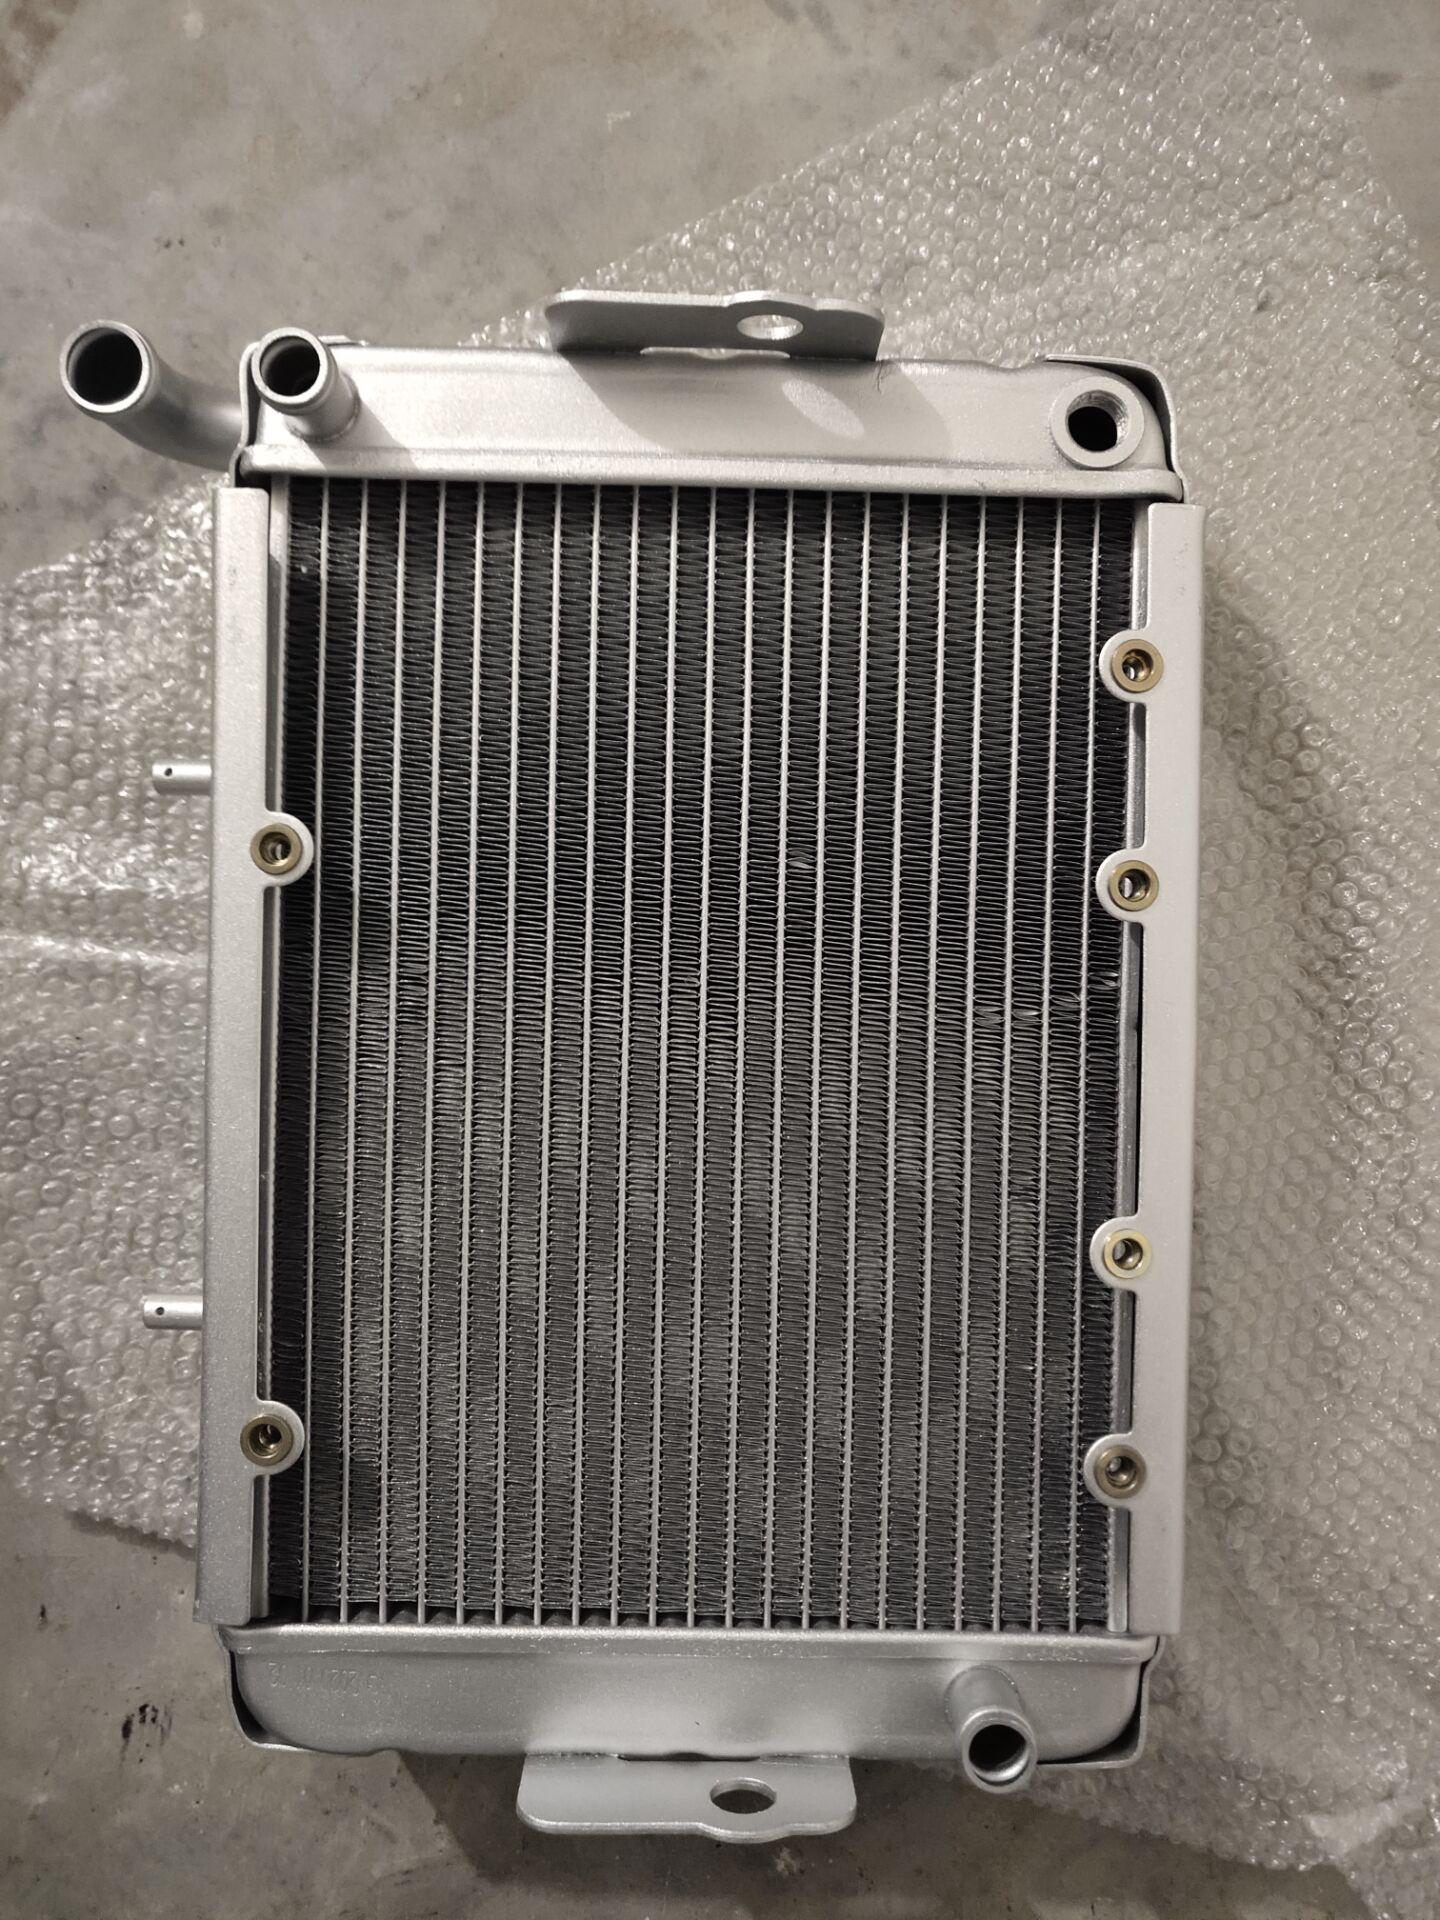 Wasser kühler kühlung maschine fit für LINHAI 300ATV/Linhai LH300 CUV 4WD